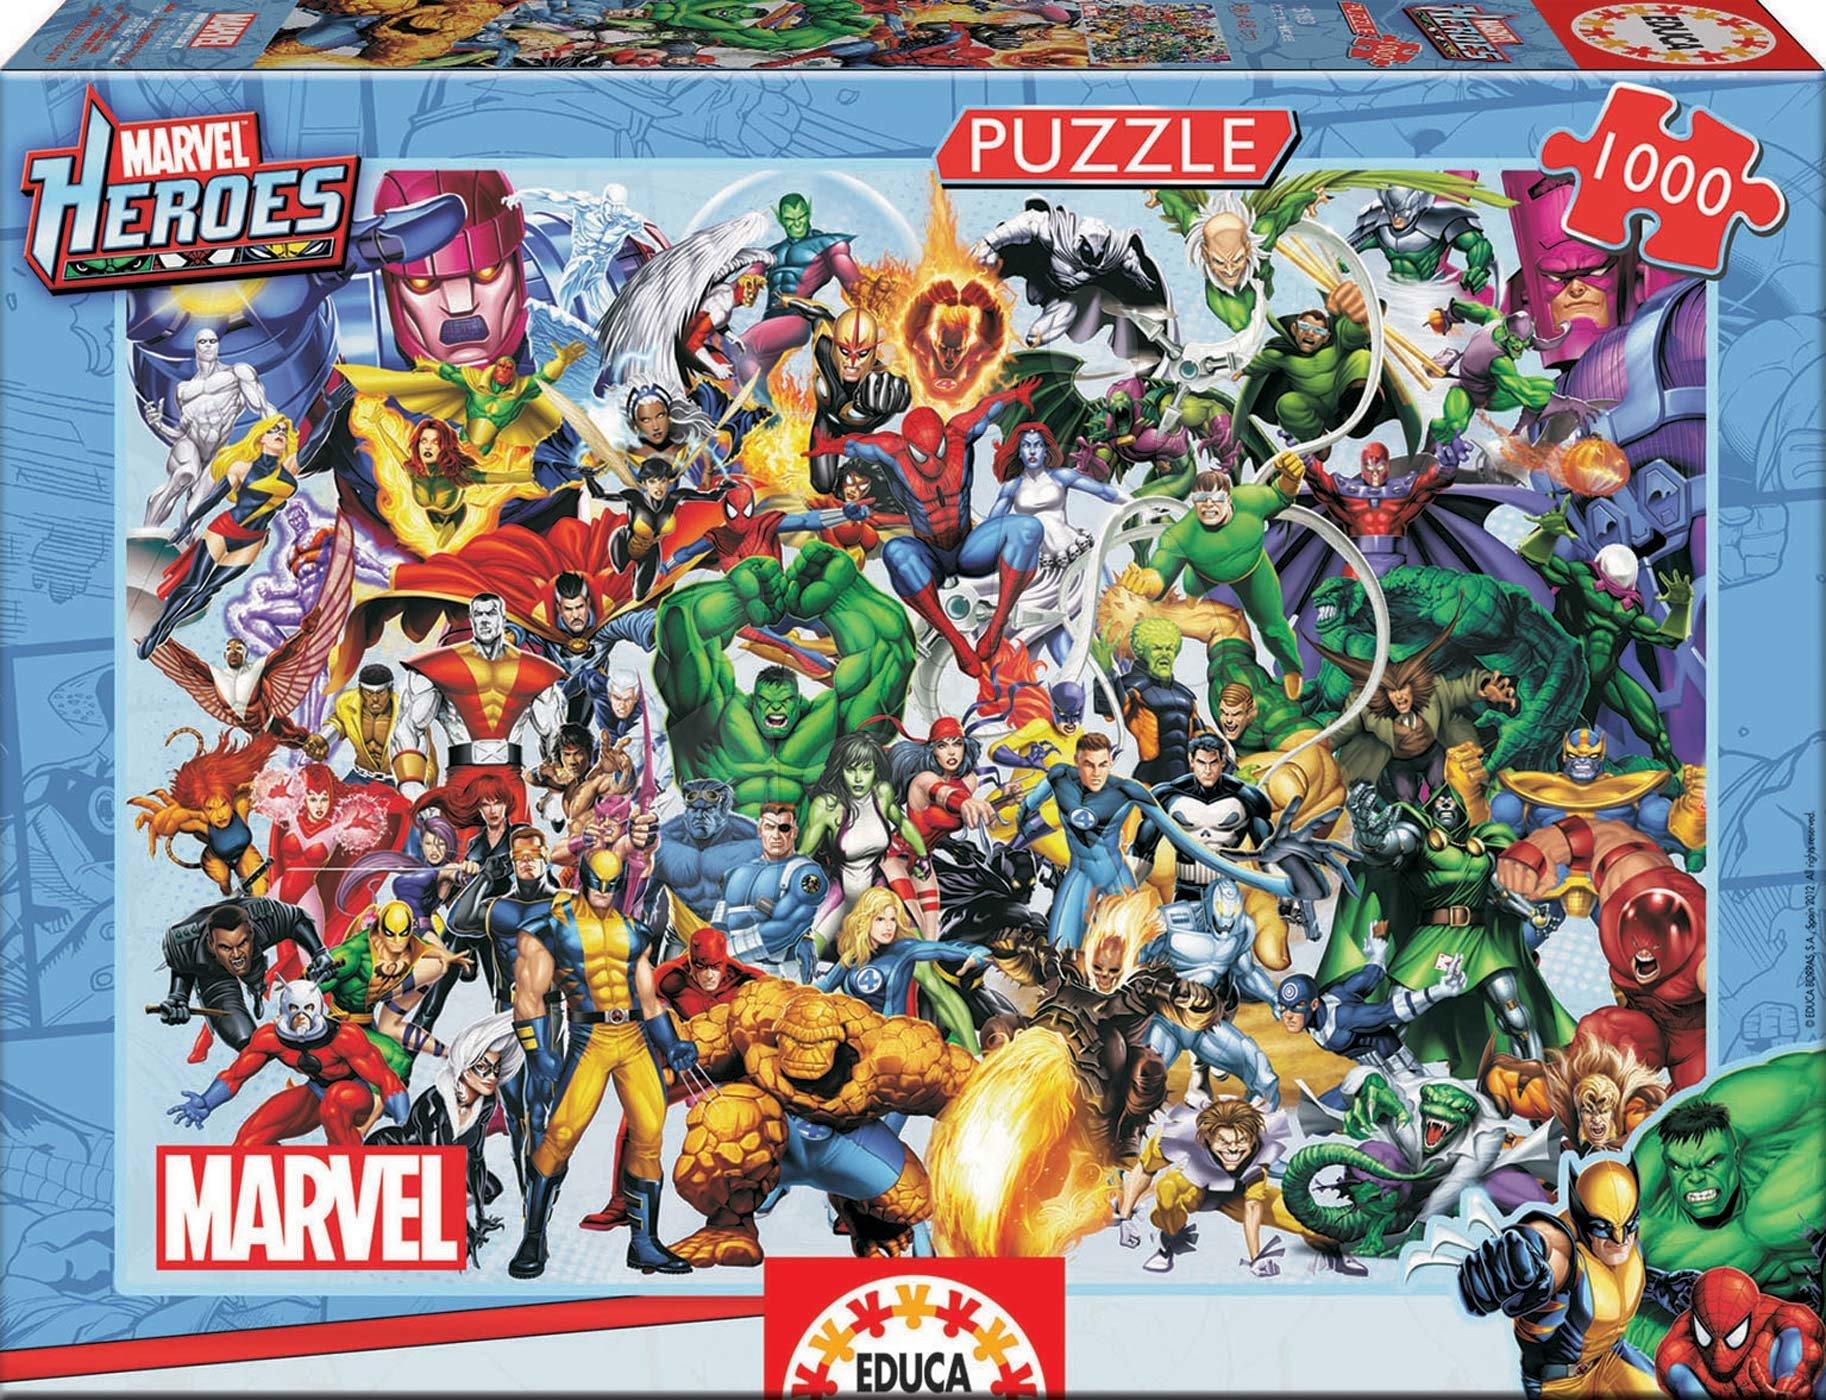 Educa Puzzle Marvel Heroes 1000 dielikov 15193 farebné